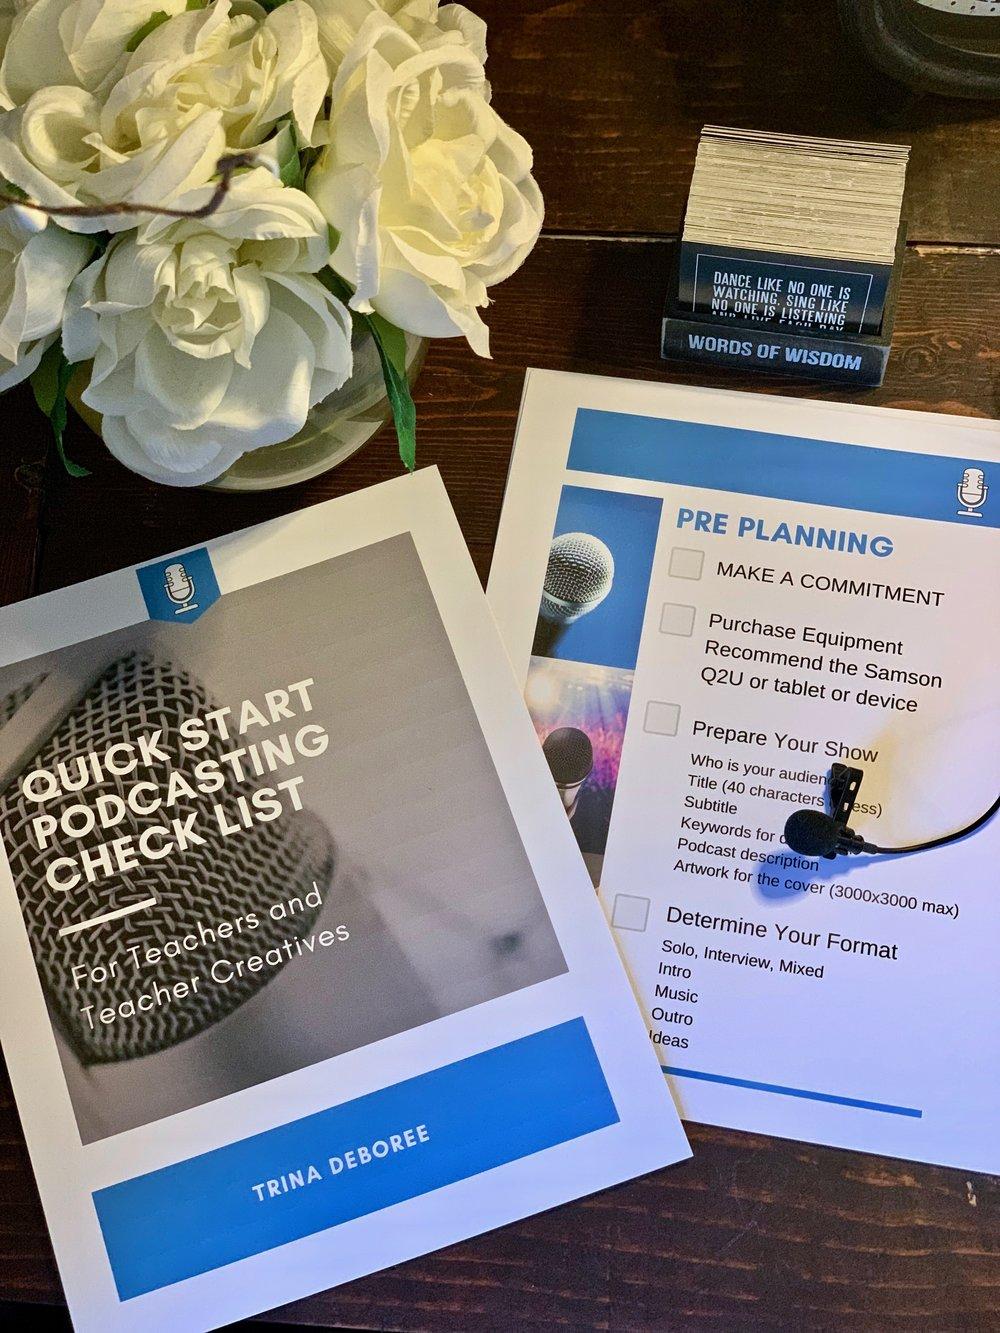 Podcasting Quick Start Guide Freebie #podcastingforteachers #podcastingforteachercreatives